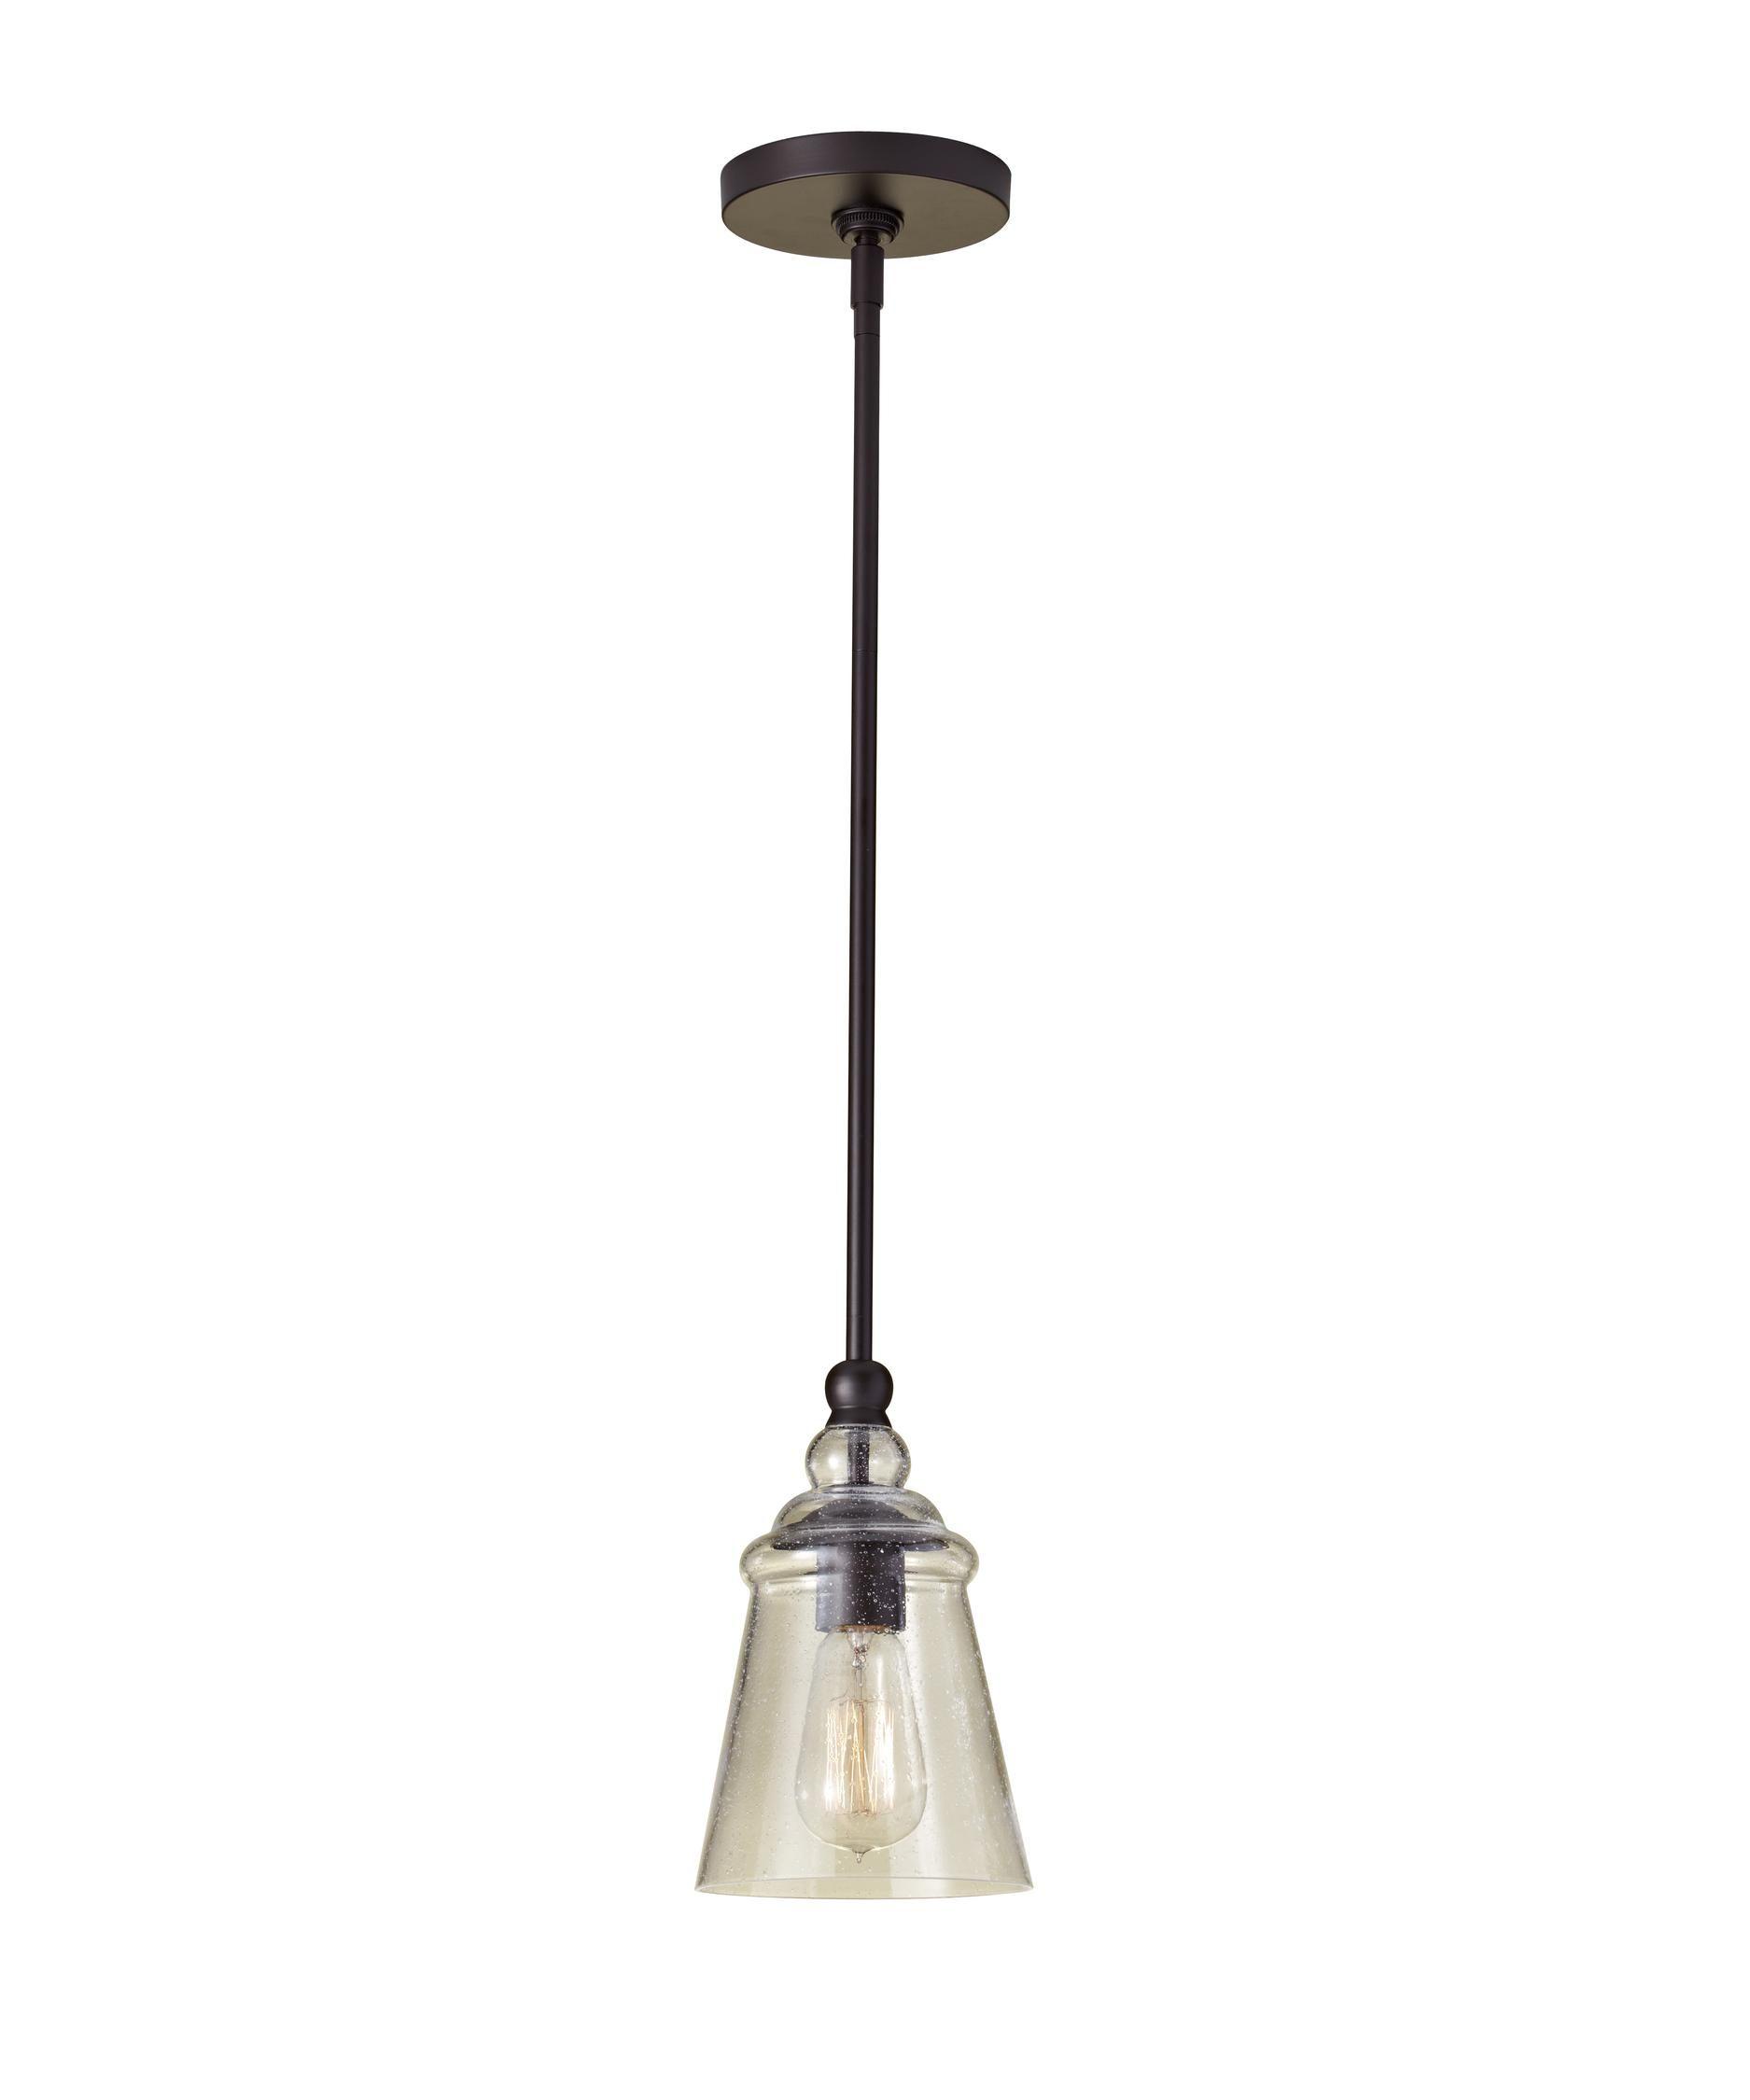 Feiss Urban Renewal 5 Inch Mini Pendant By Generation Lighting